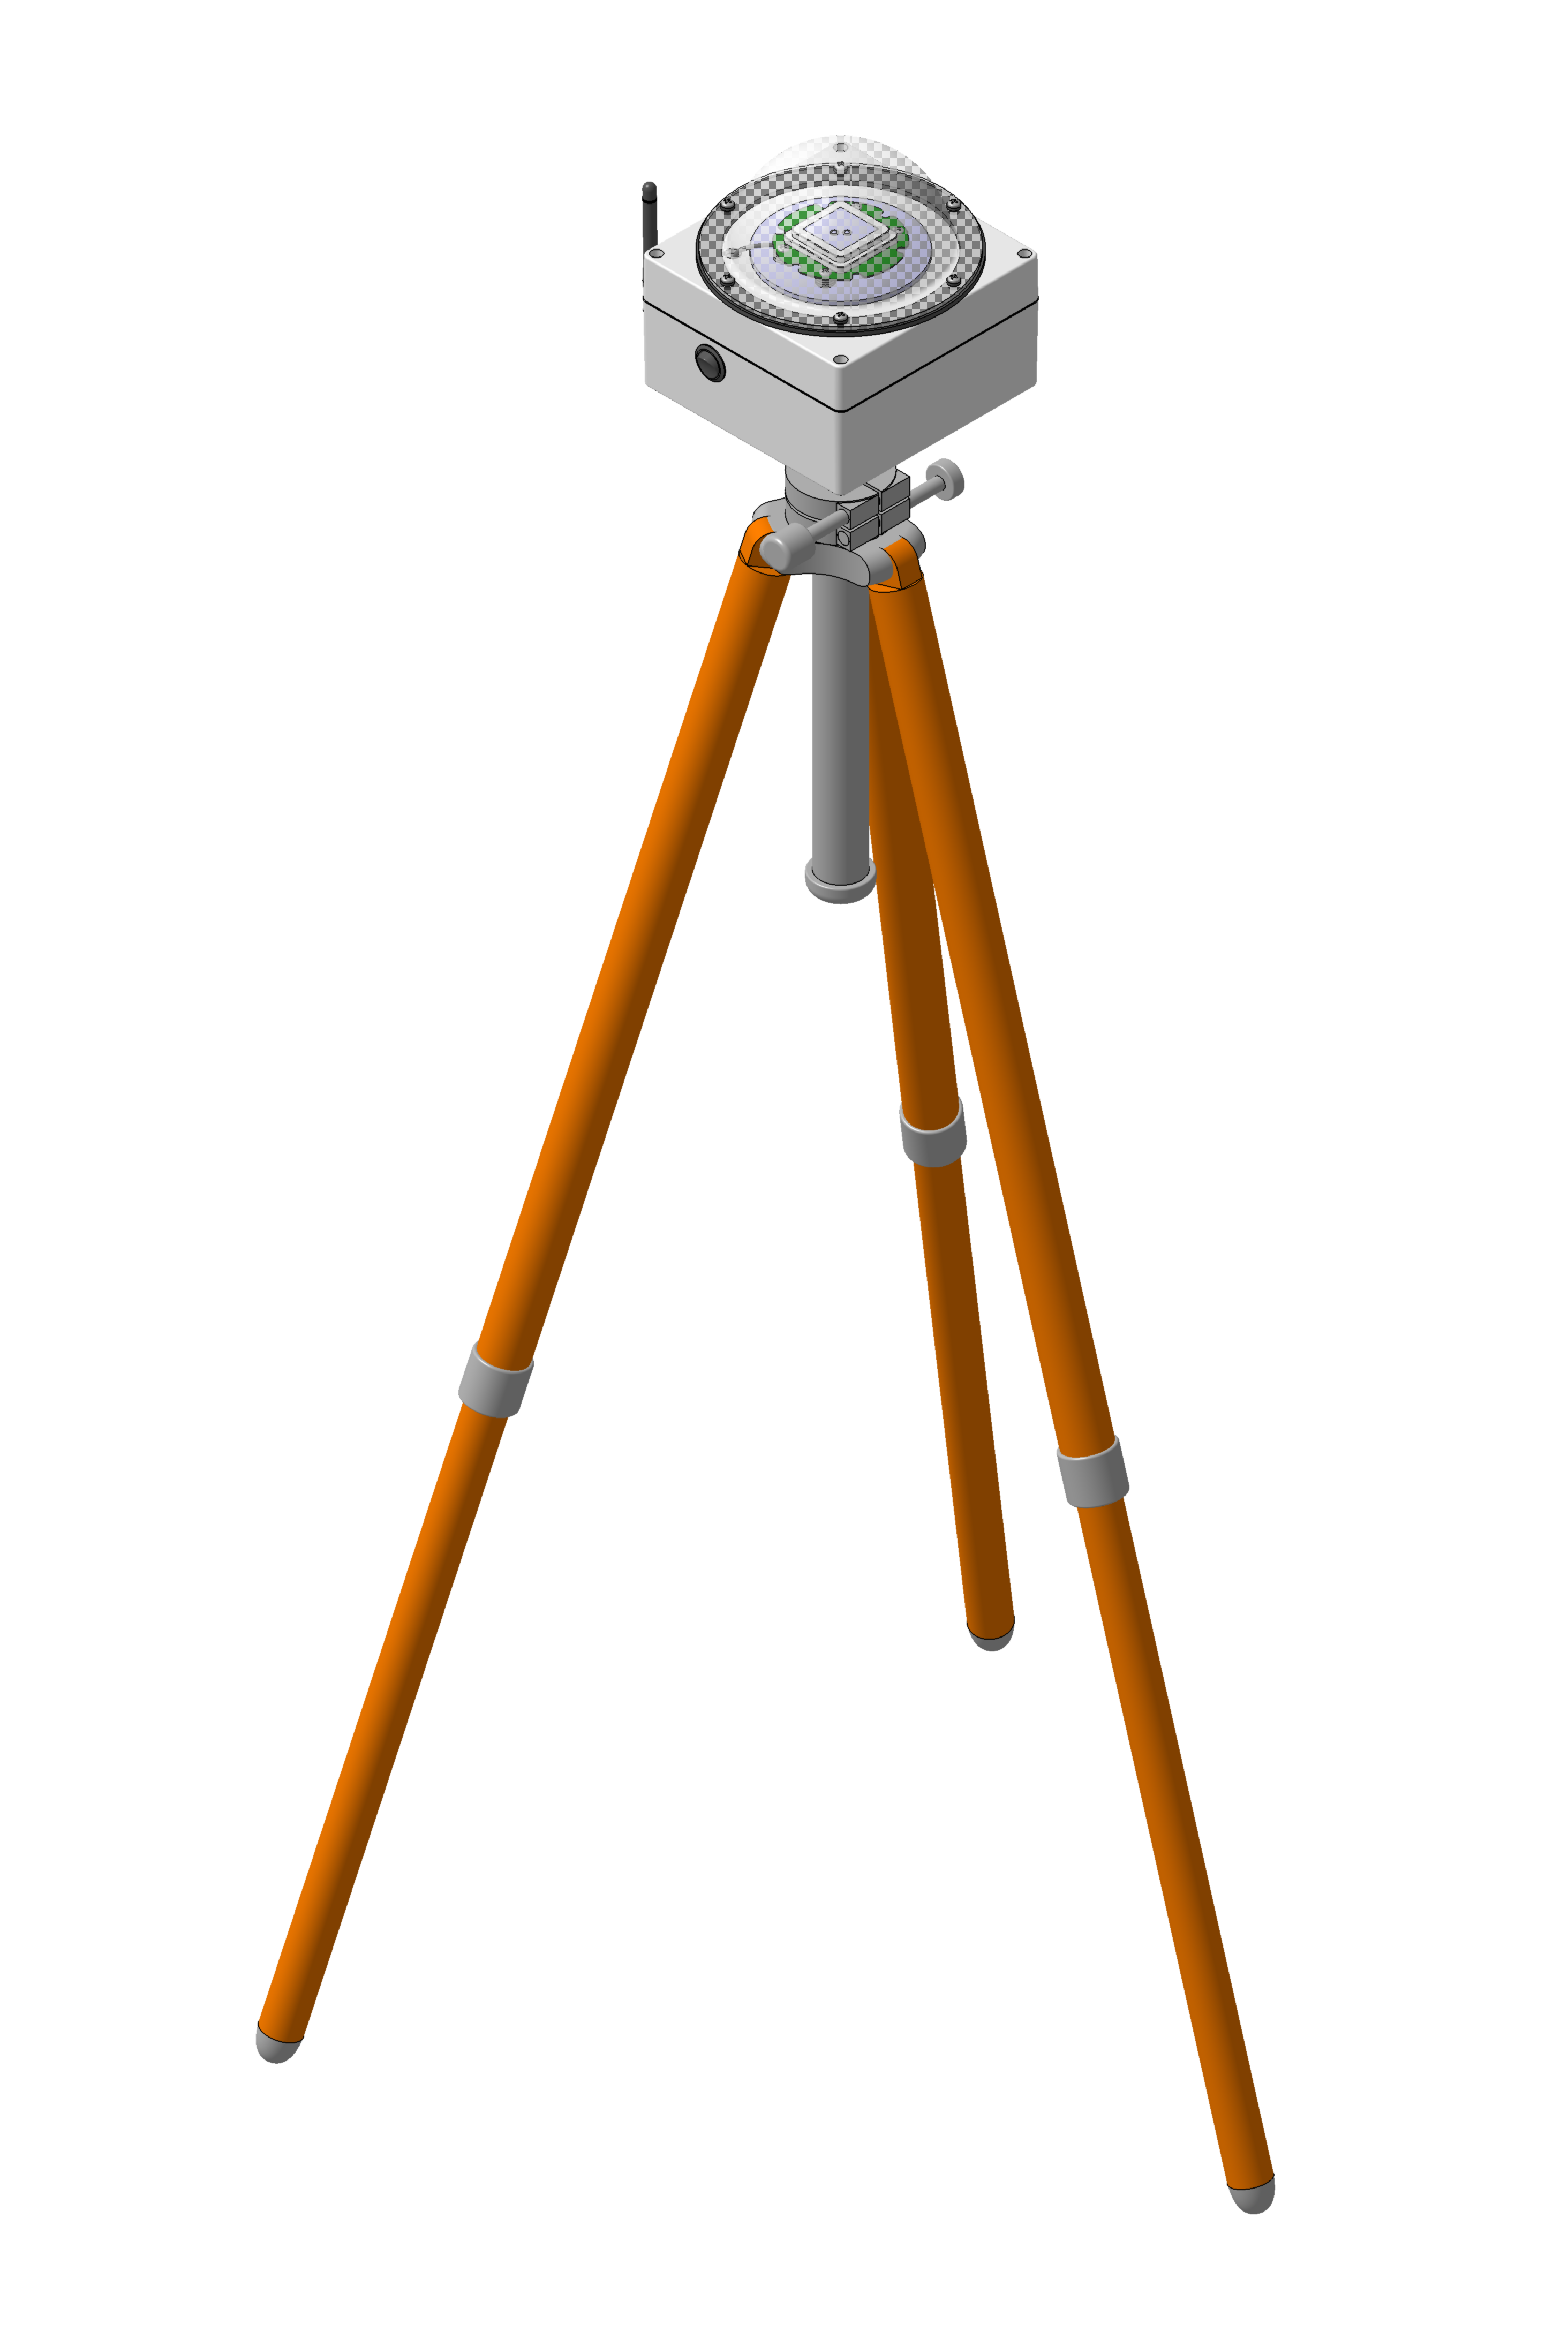 RSTP-A10001 (06-21-19)